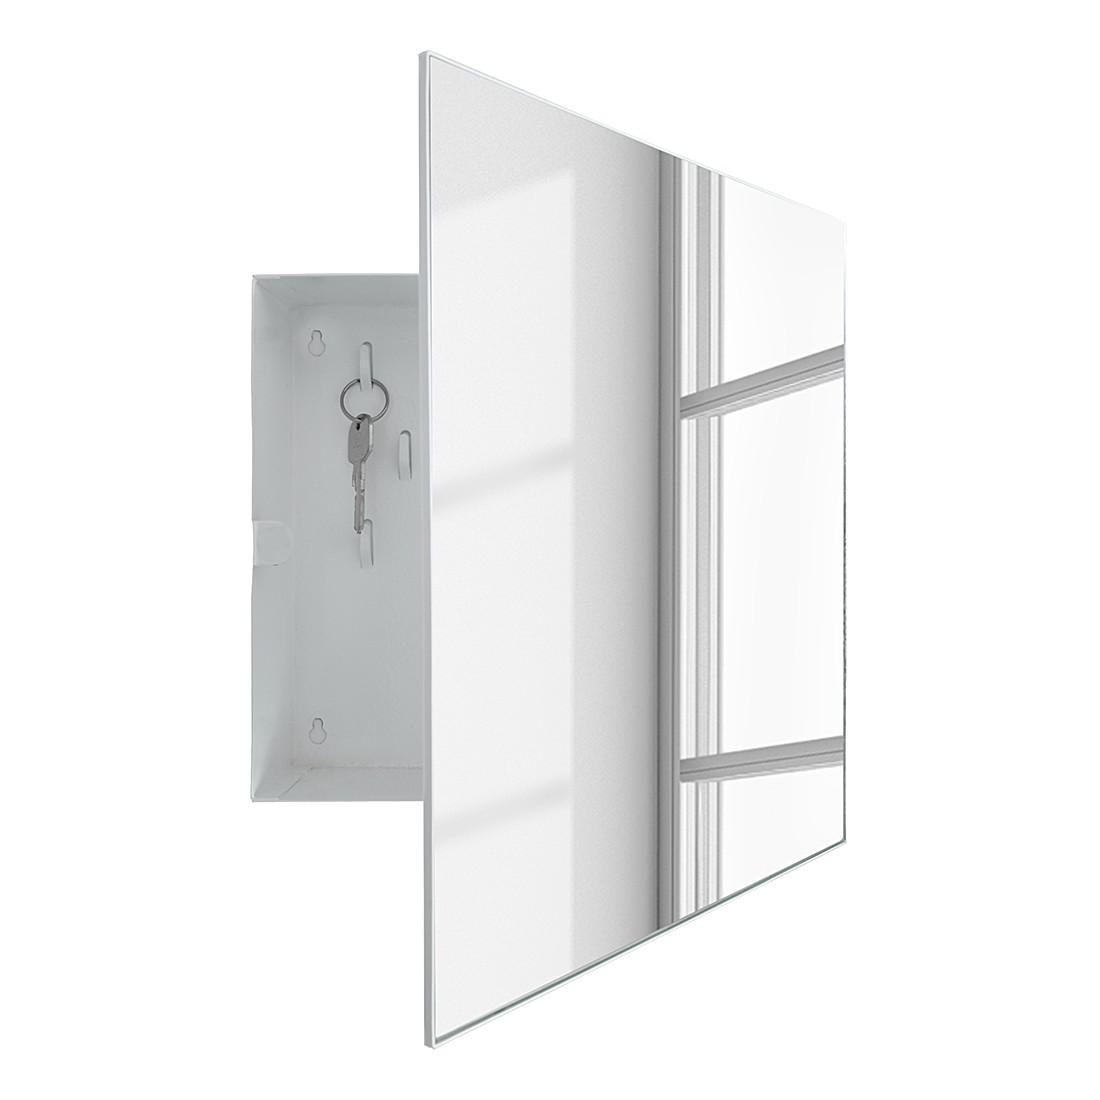 Sleutelkastje Mirror- Box - metaal/spiegelglas, loftscape